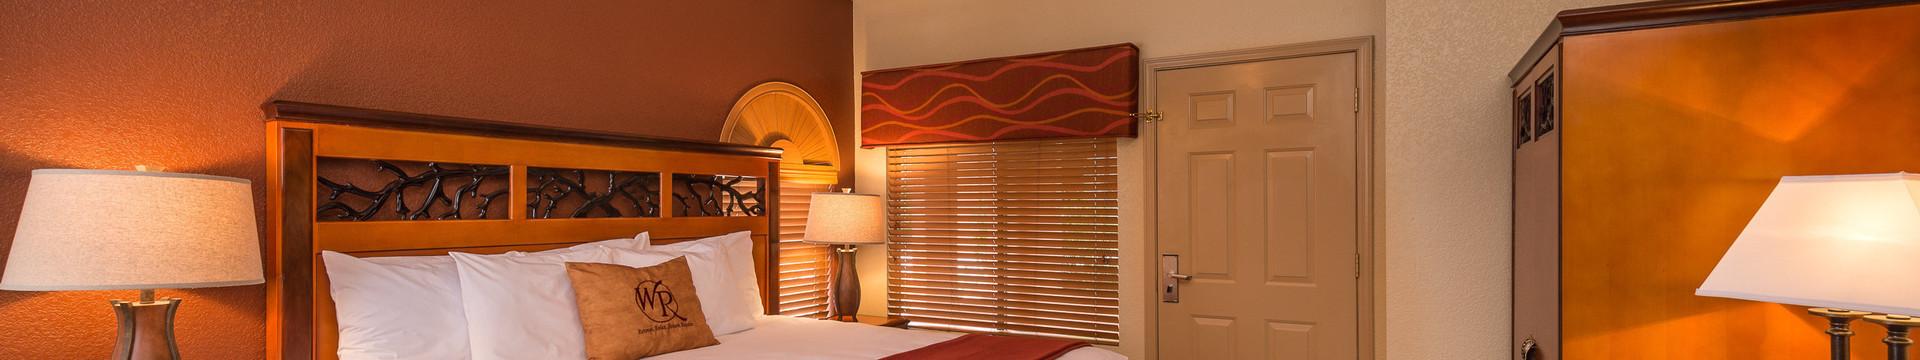 2 Bedroom Villa Suites at our Branson Resort | Interior of Villa Bedroom